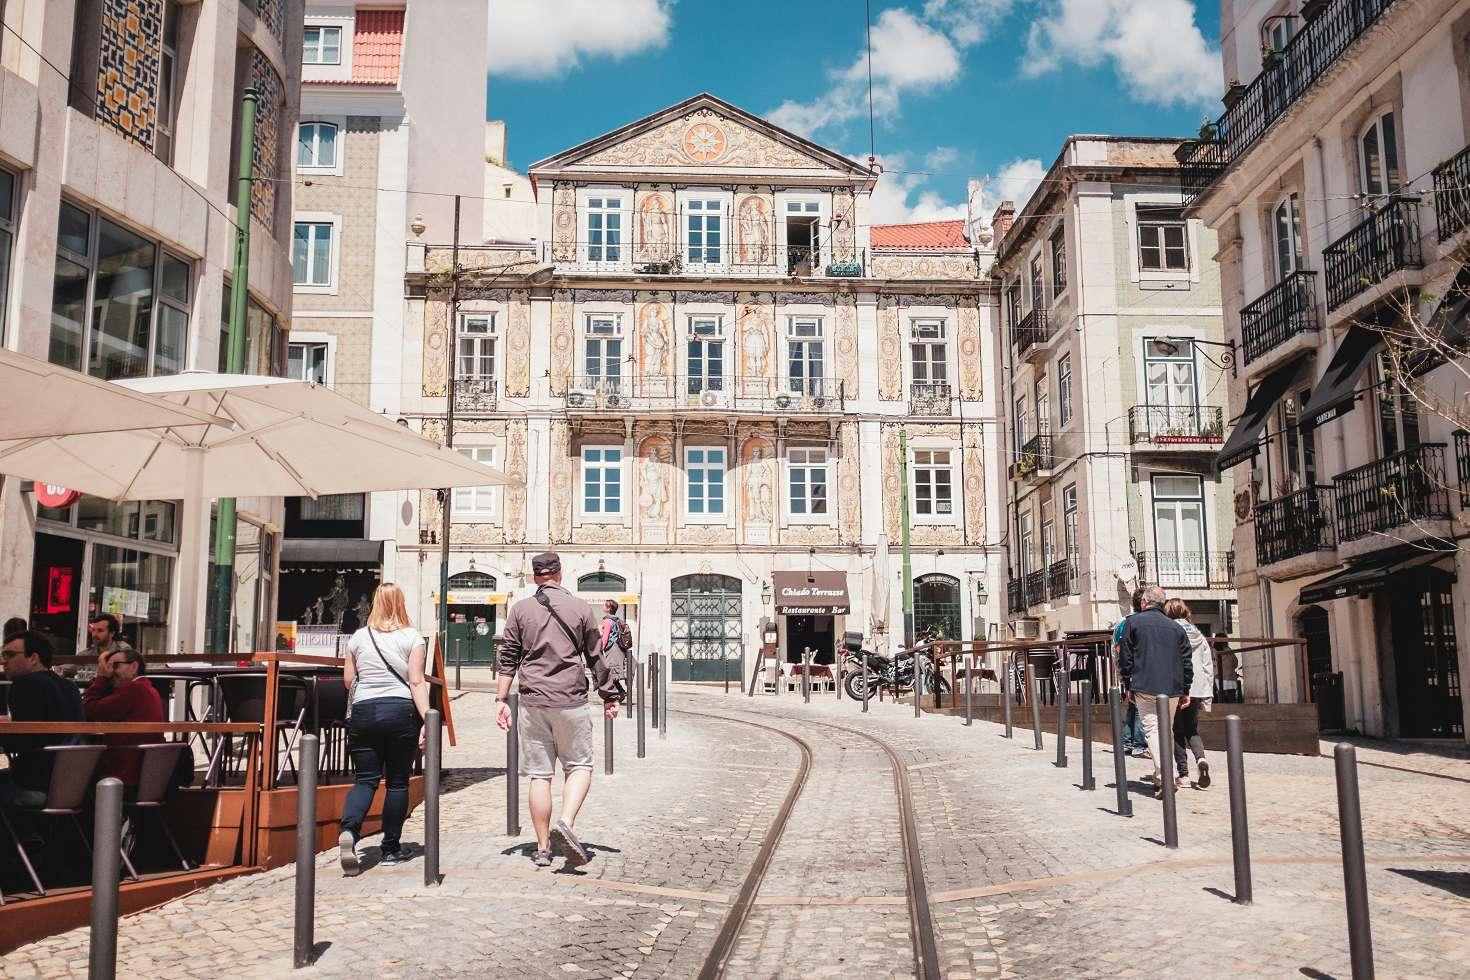 Valencia-Lissabon-Vigo-Stonehenge (27)